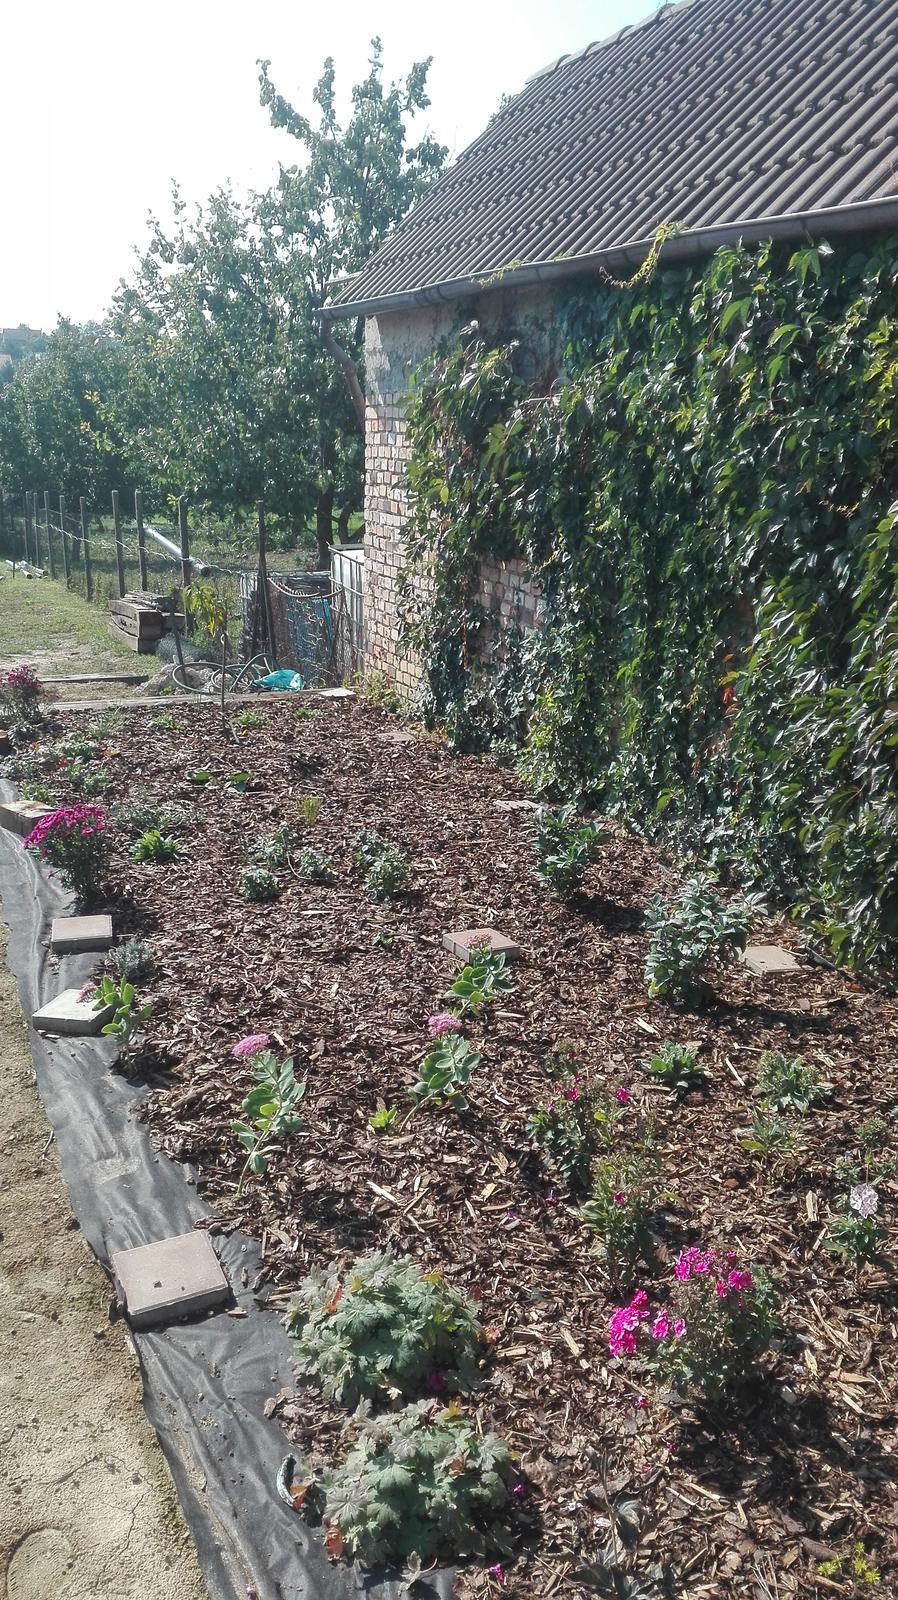 Názov stavby 3 - in da garden - september 2017